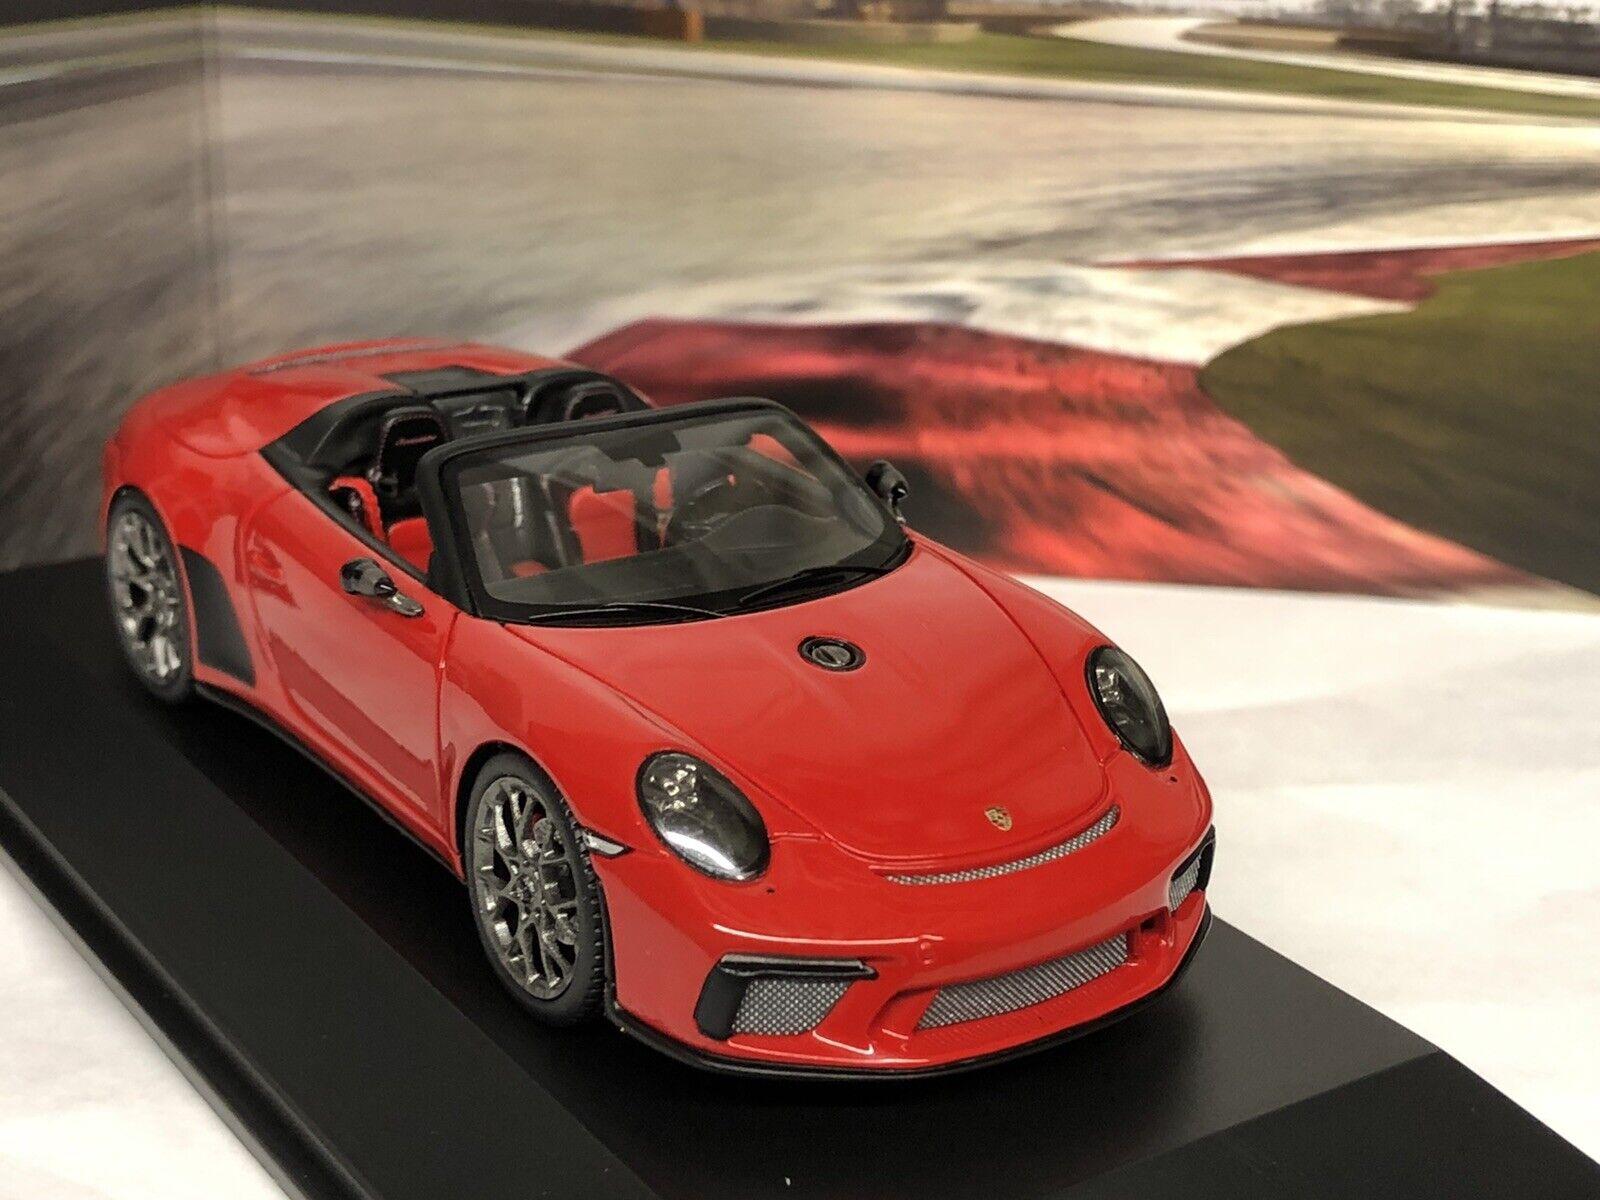 Porsche 911 Speedster Concept 1 of 300